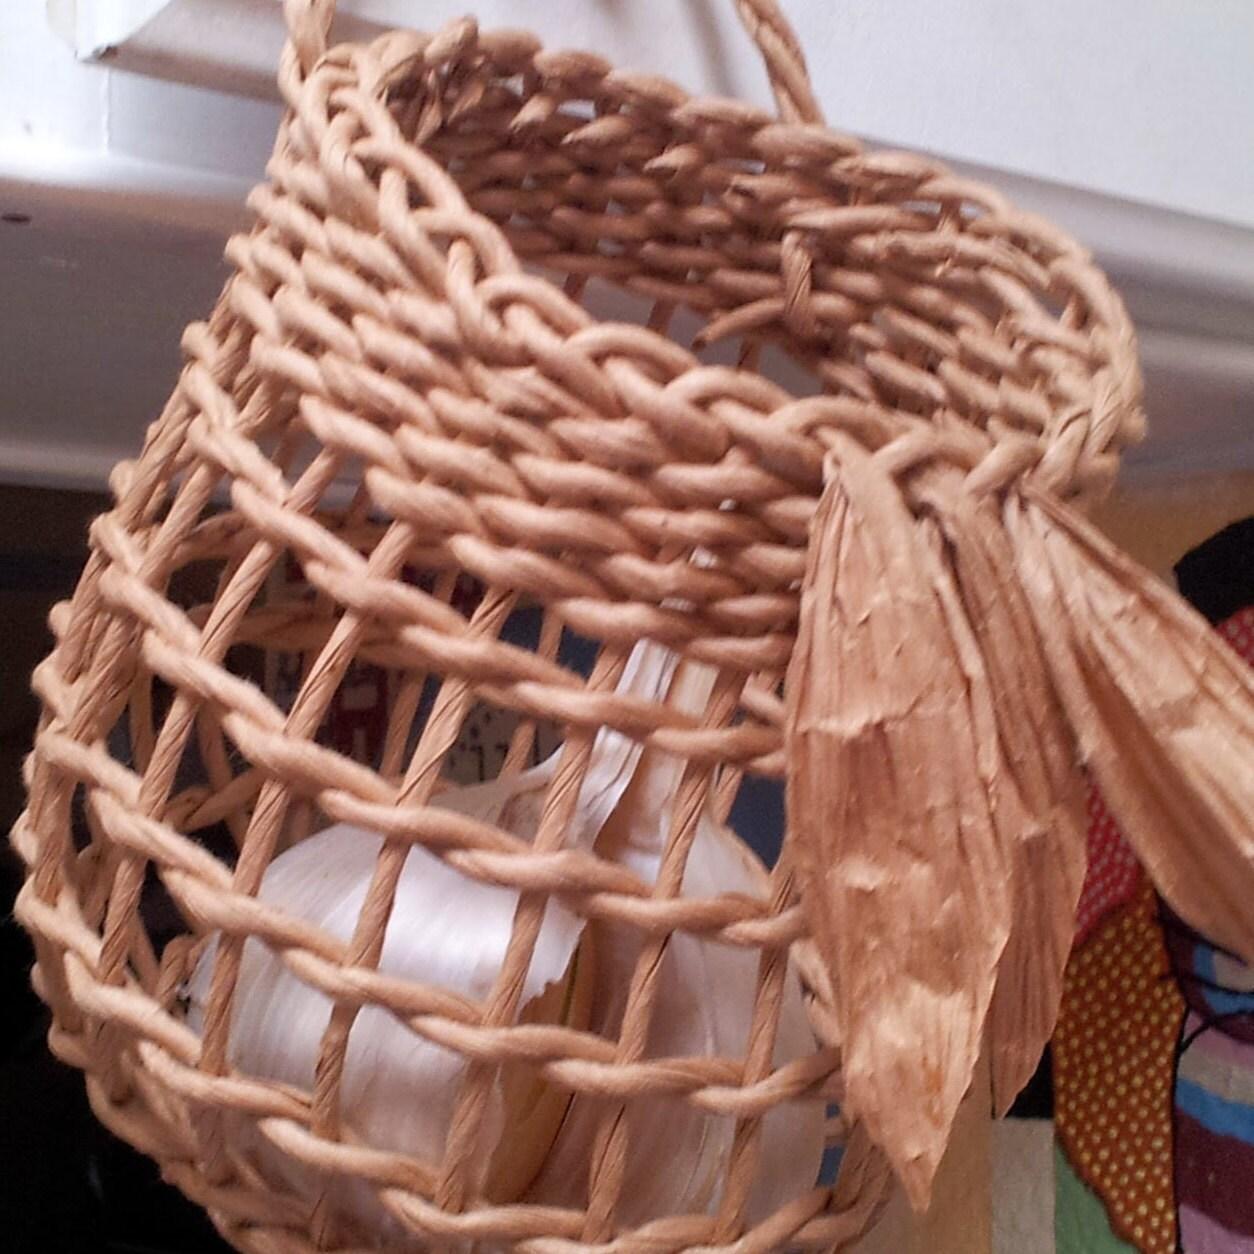 Superb Basketrybotanica